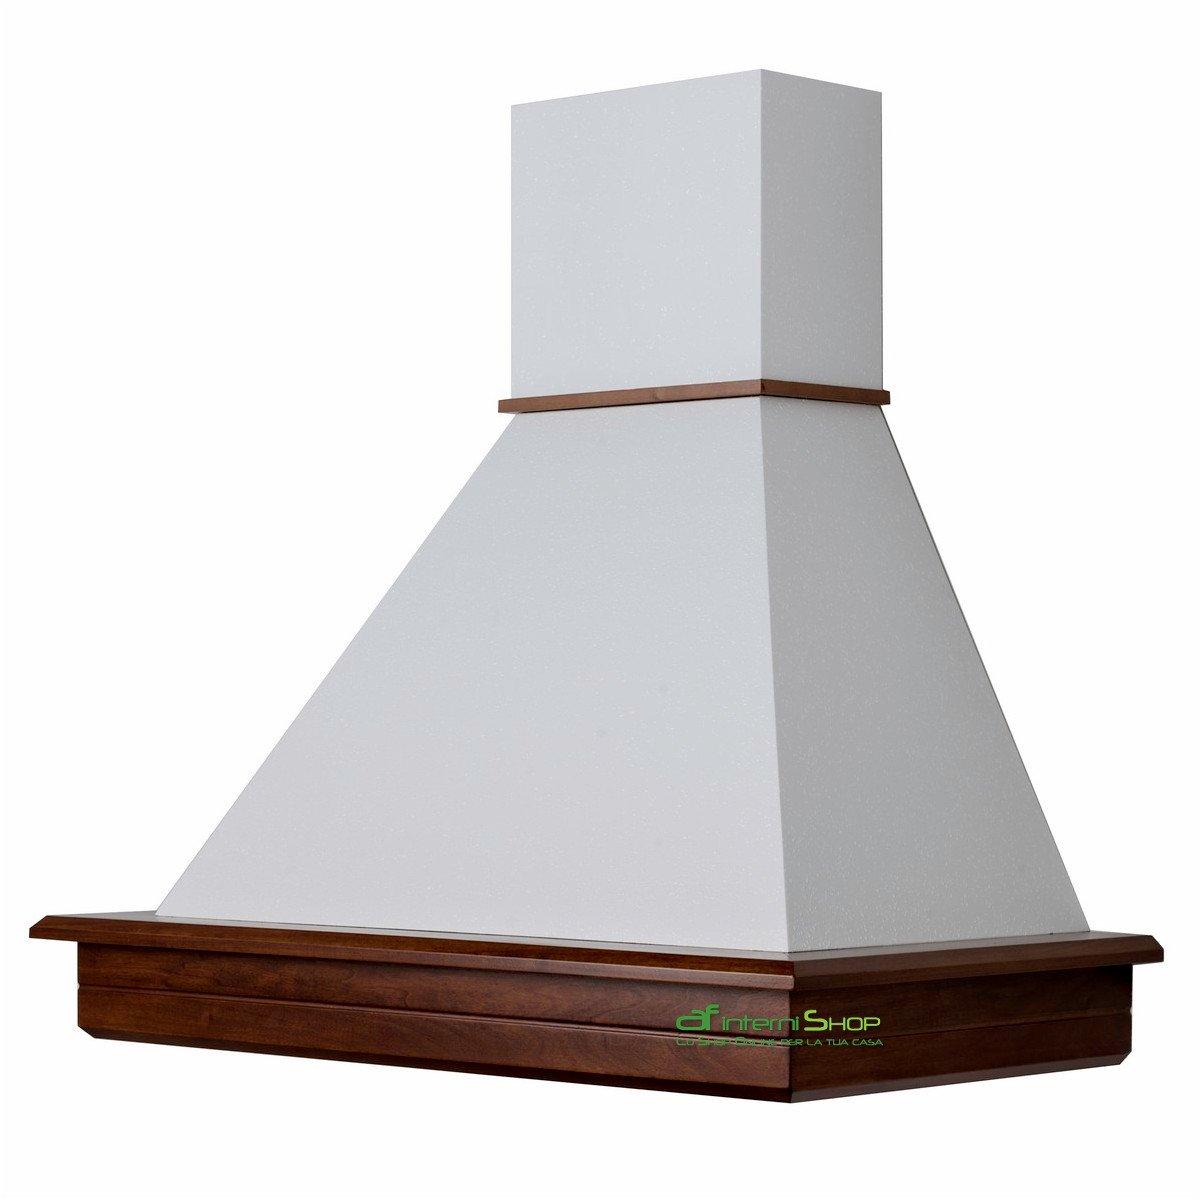 Cappa cucina rustica legno mod.Stock 60 da parete - Noce biondo ...